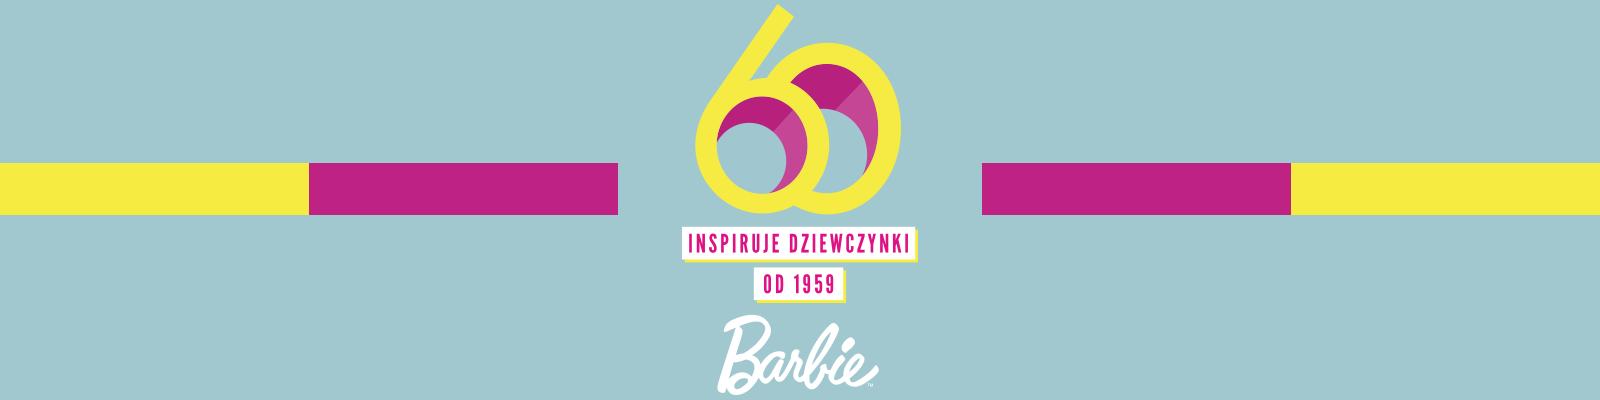 Barbie 60